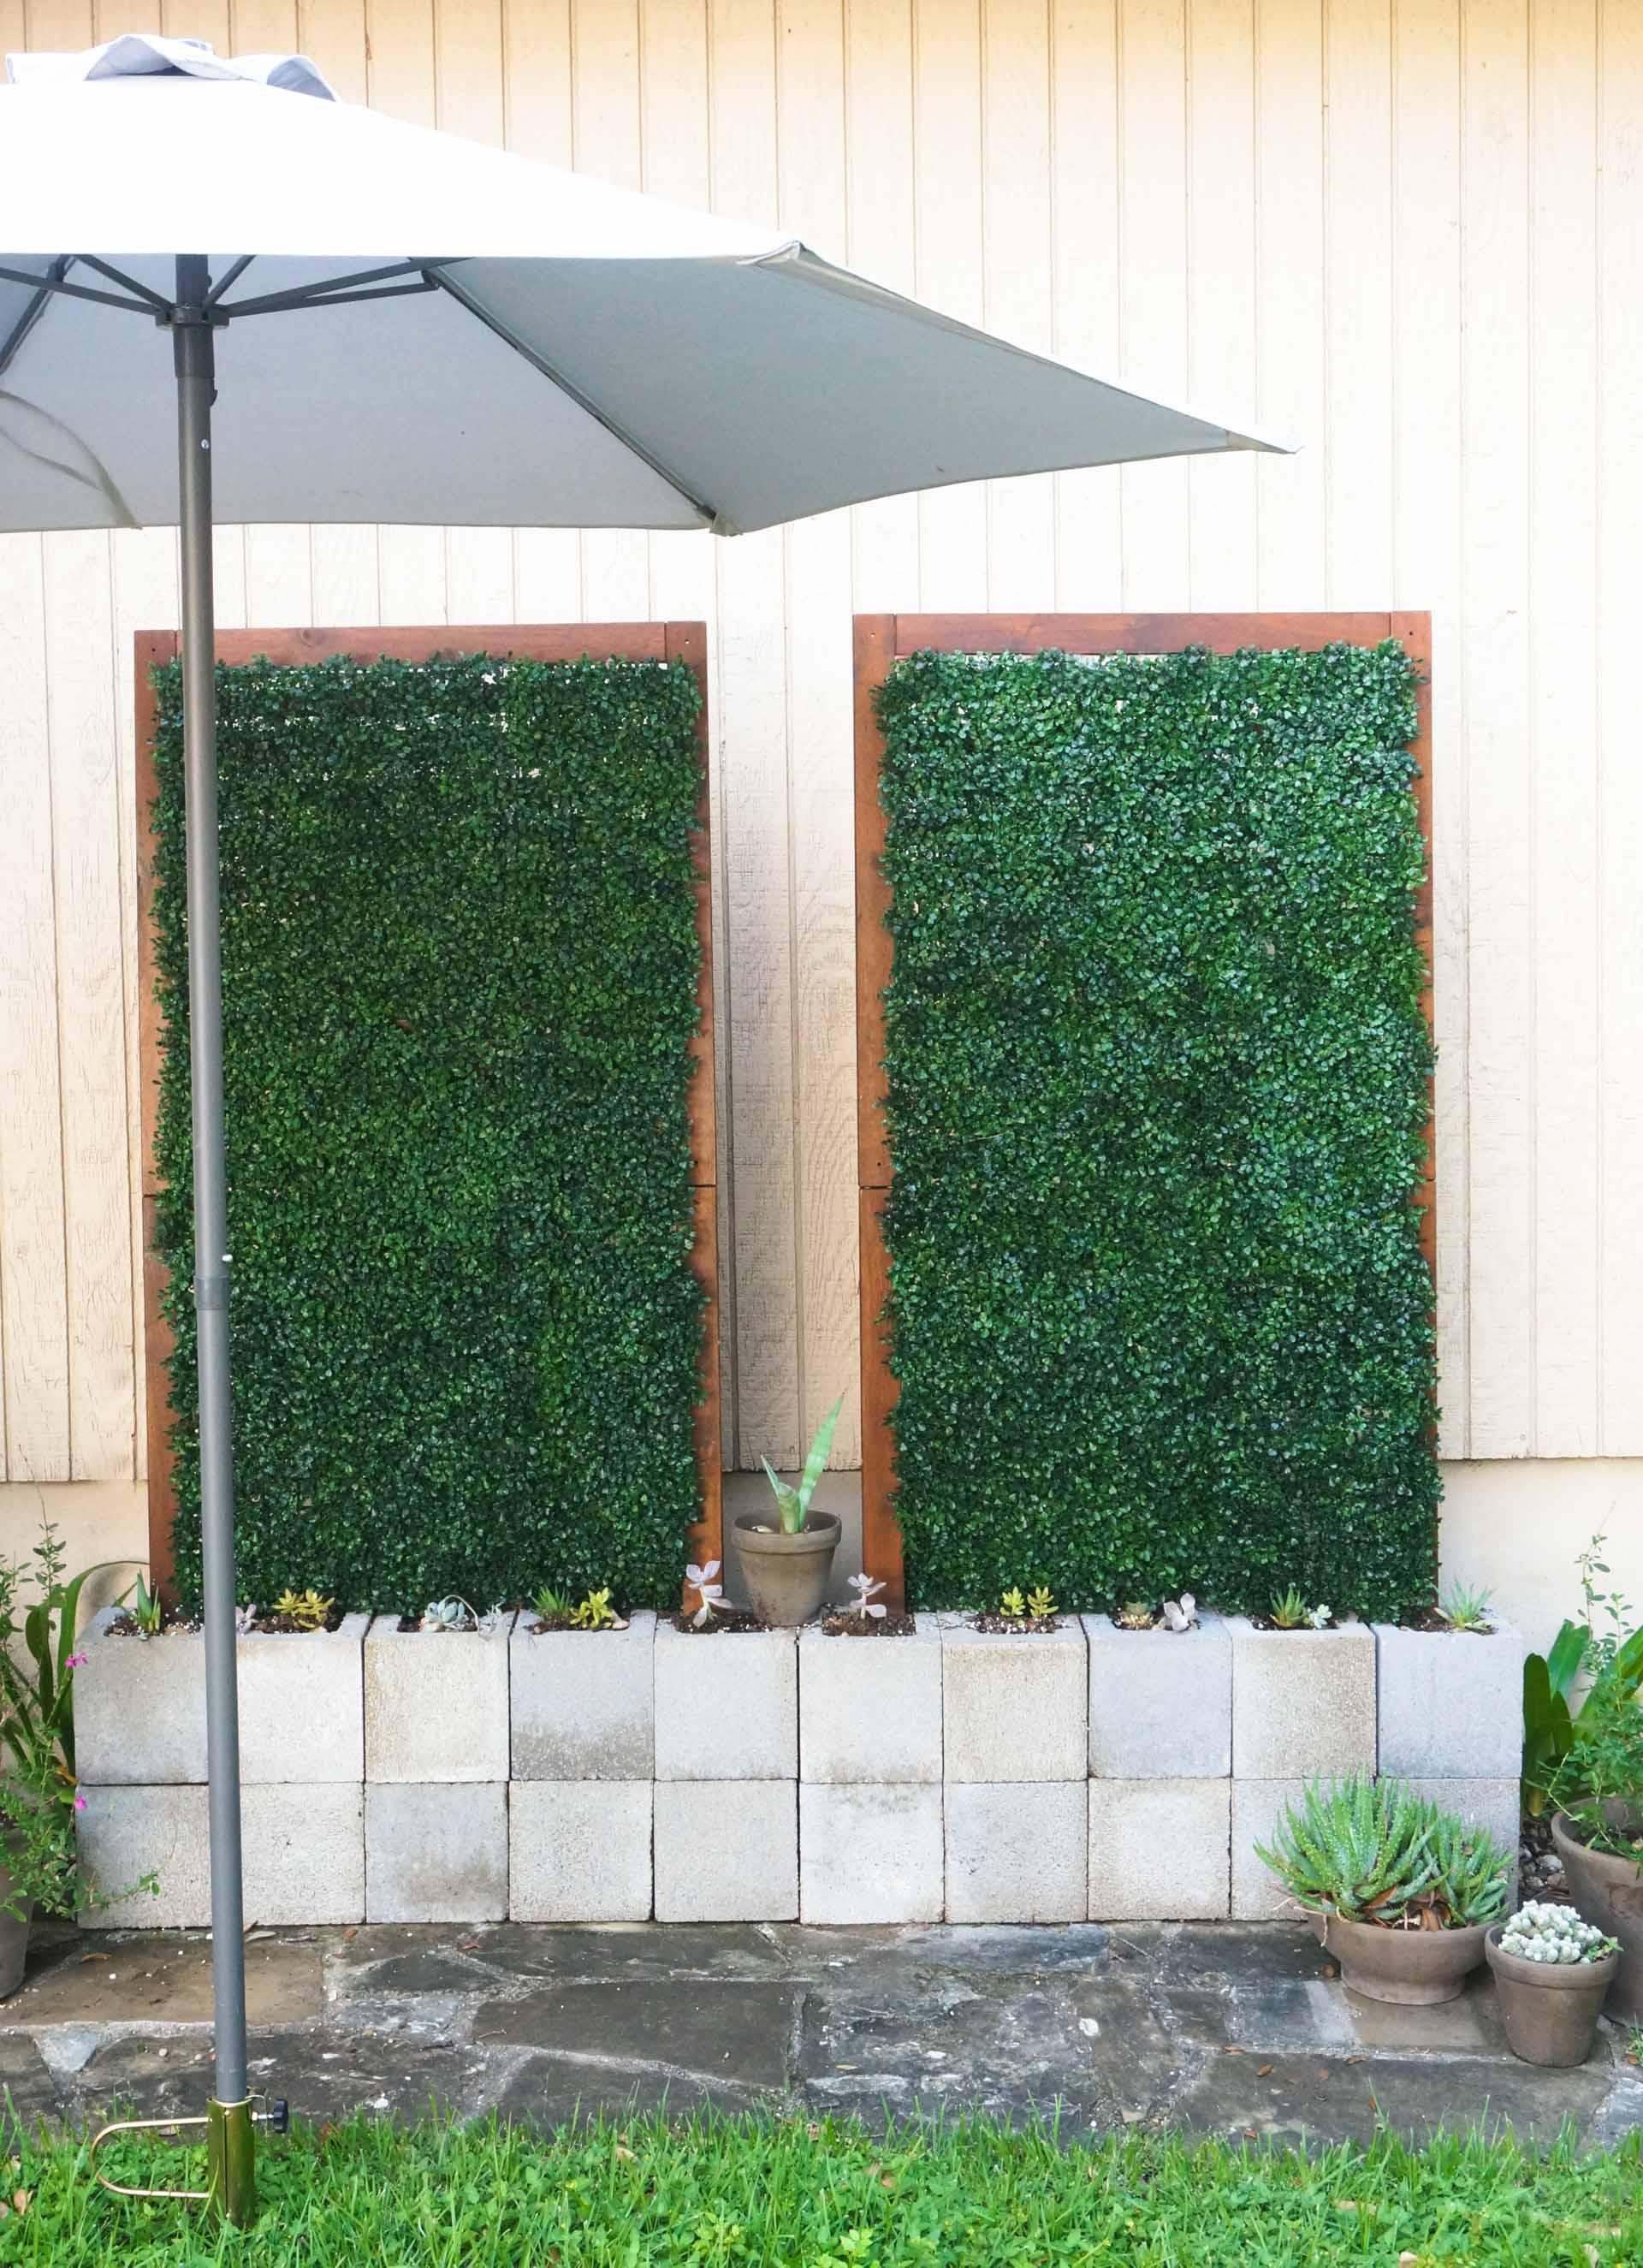 1562169714 311 backyard decorating ideas on a budget - Backyard Decorating Ideas on a Budget